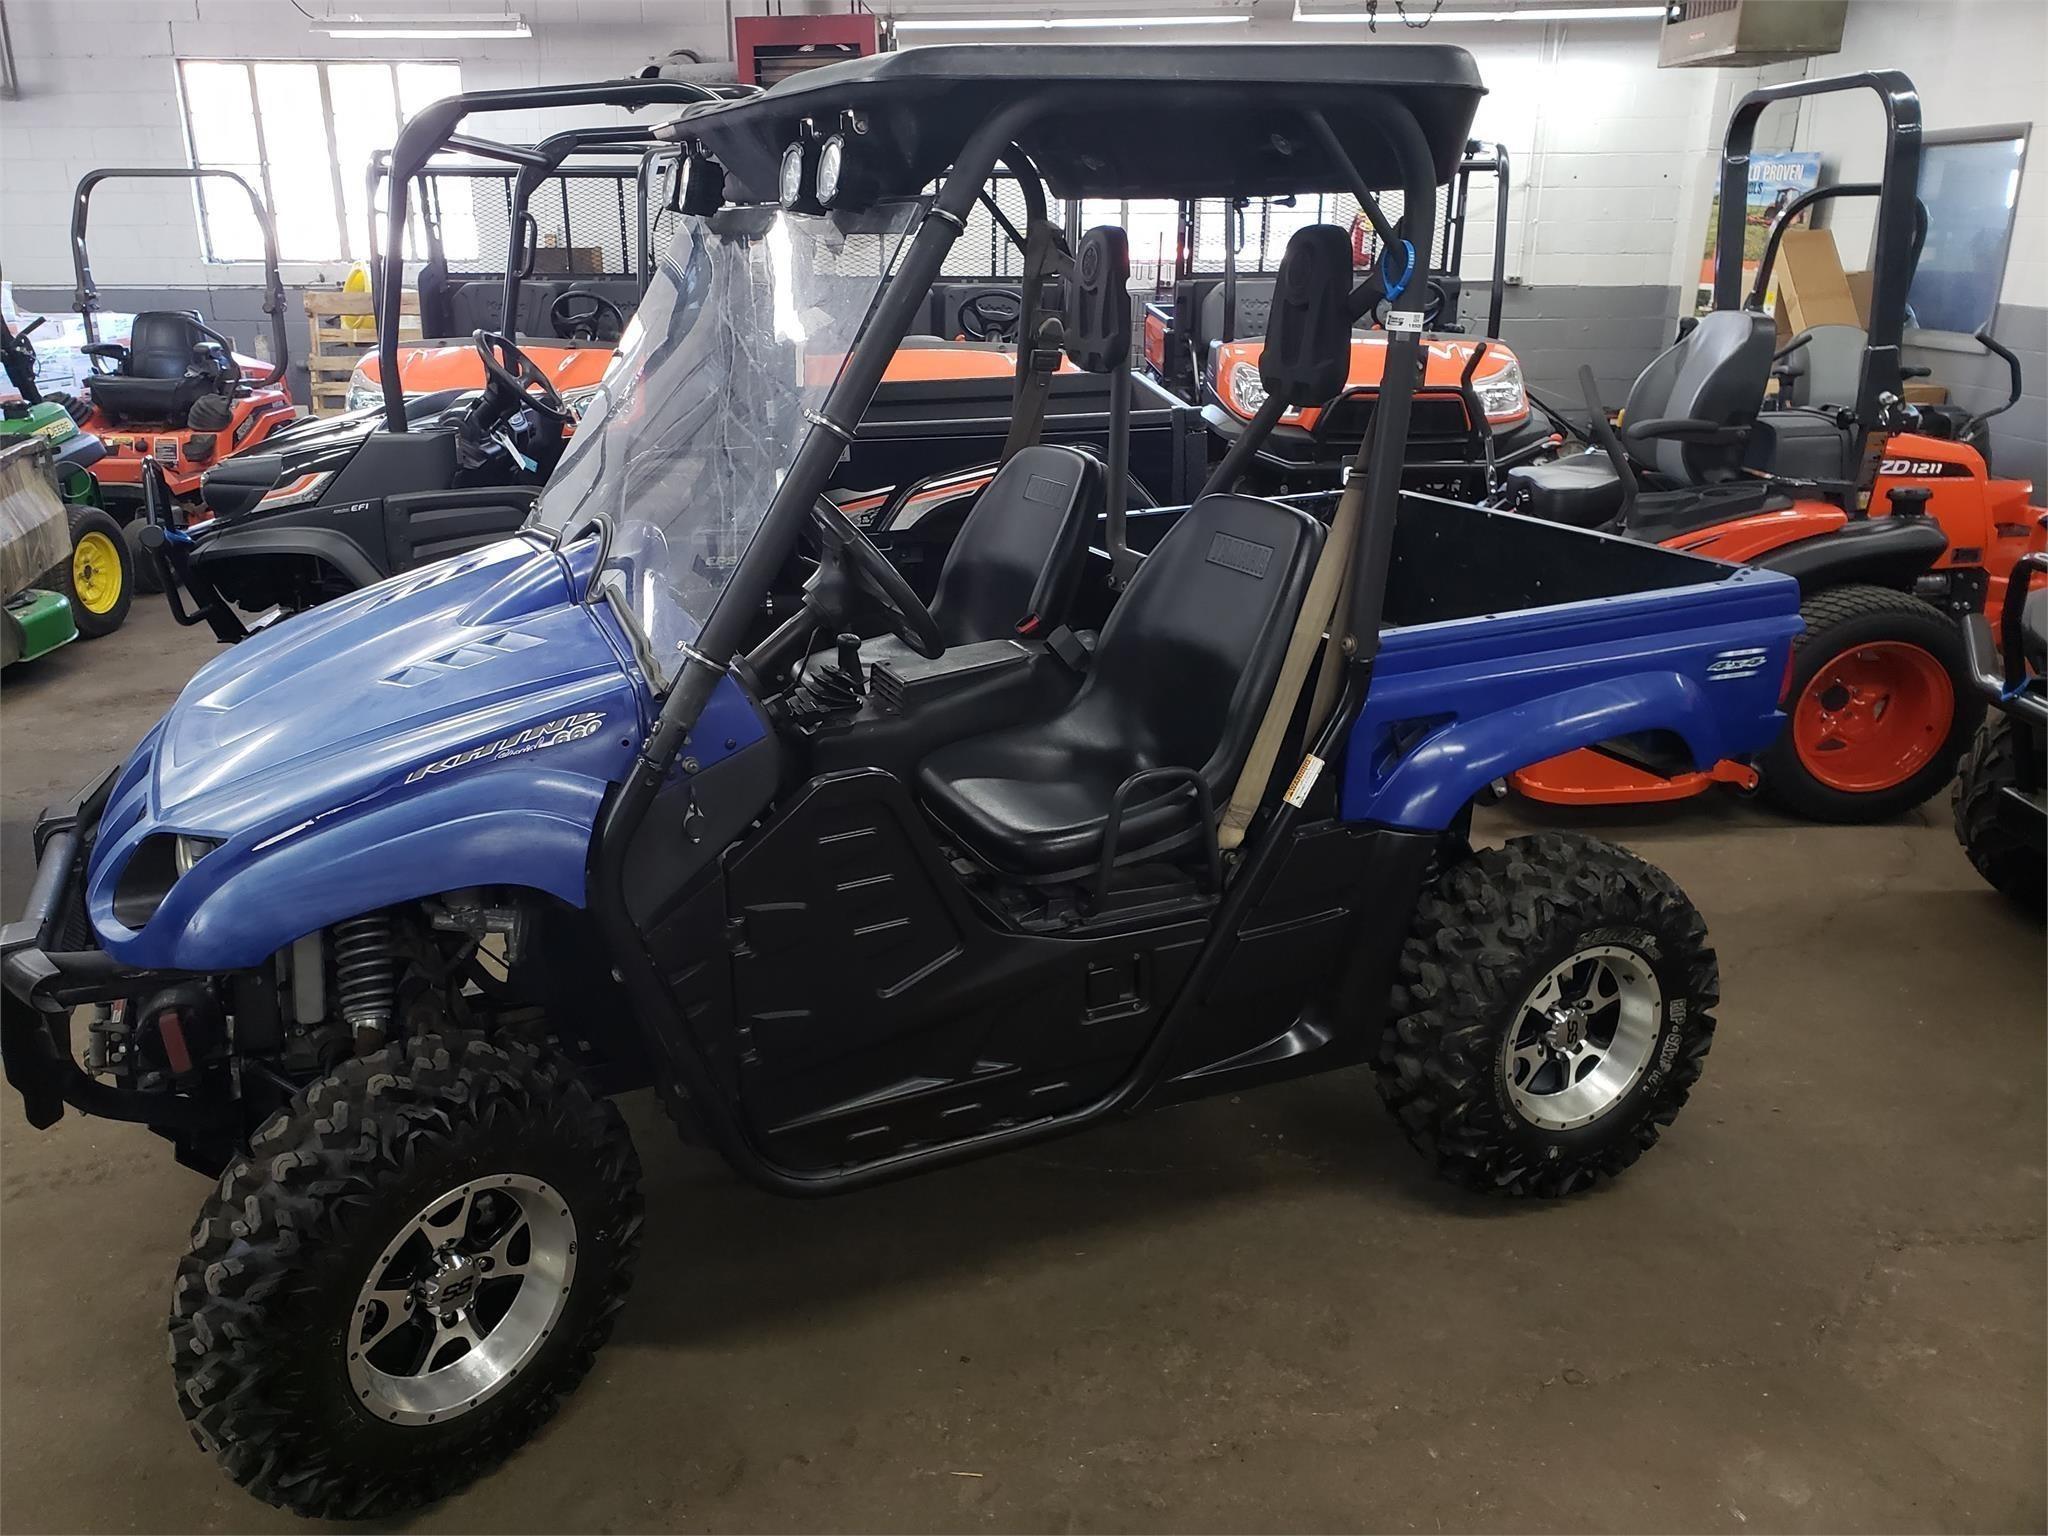 2007 Yamaha Rhino 660 ATVs and Utility Vehicle